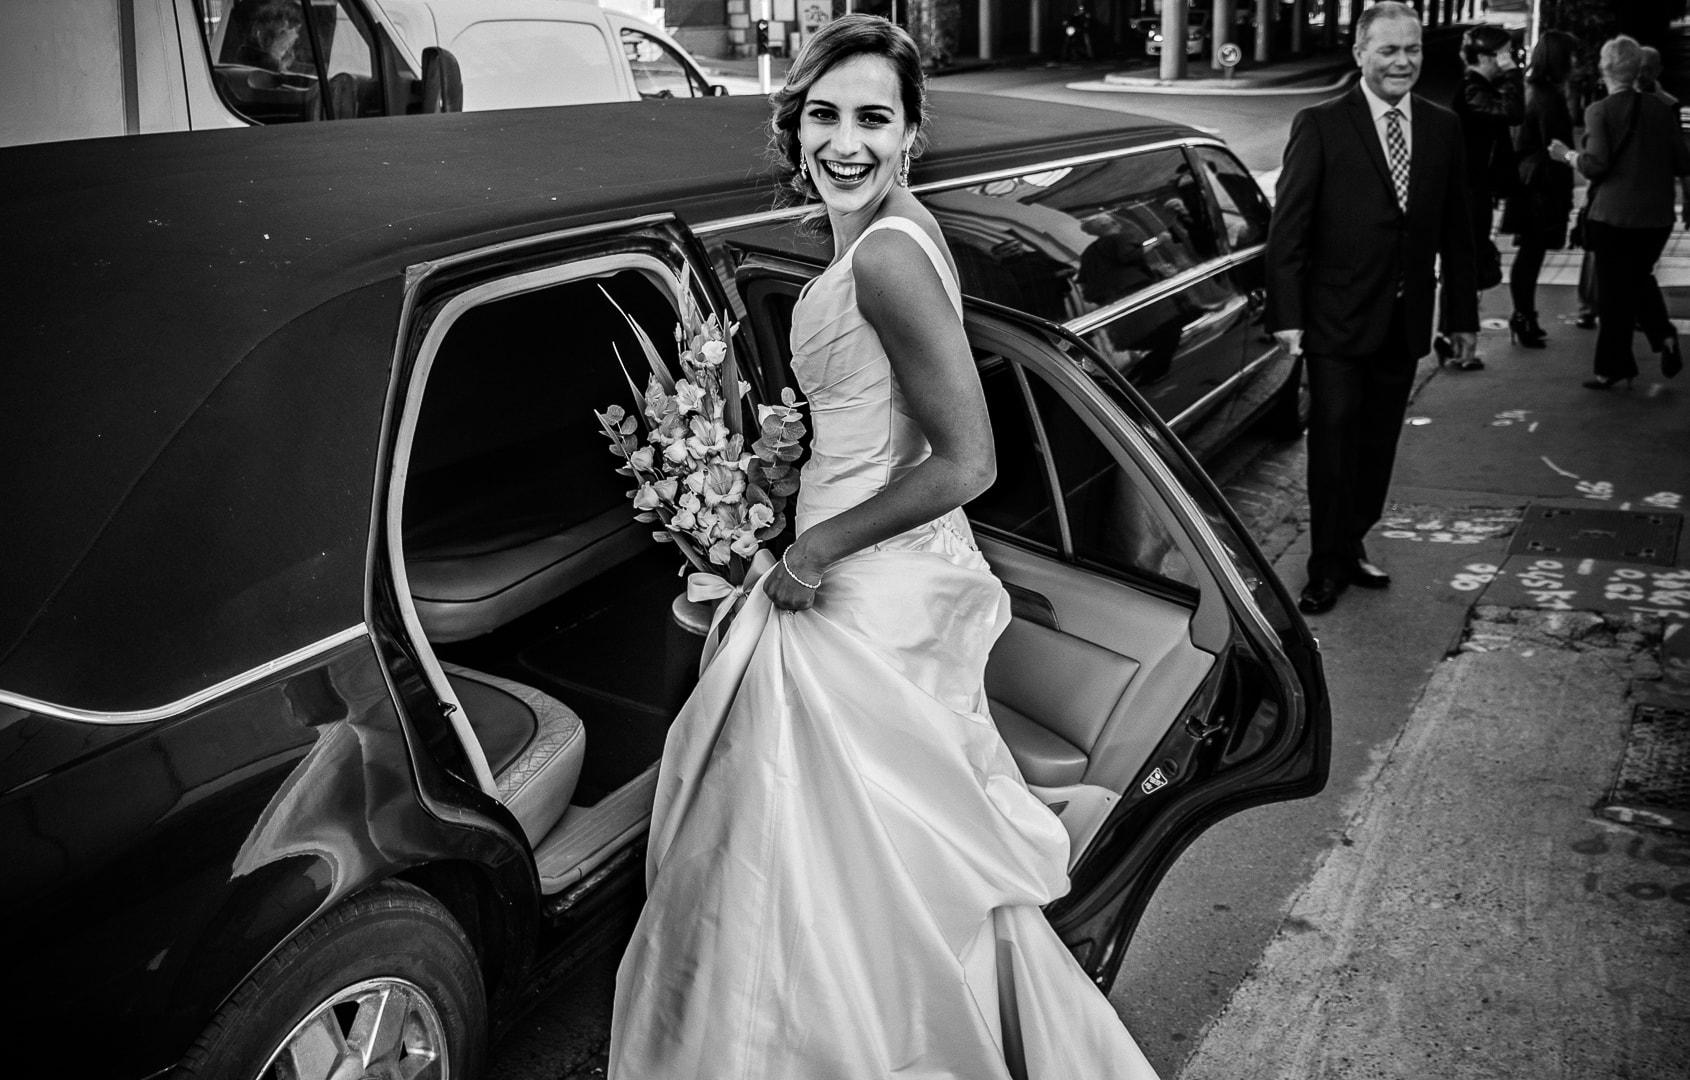 trezors-photography-photographe-professionnel-toulouse-31-mariage-reportage-photo-isabelle